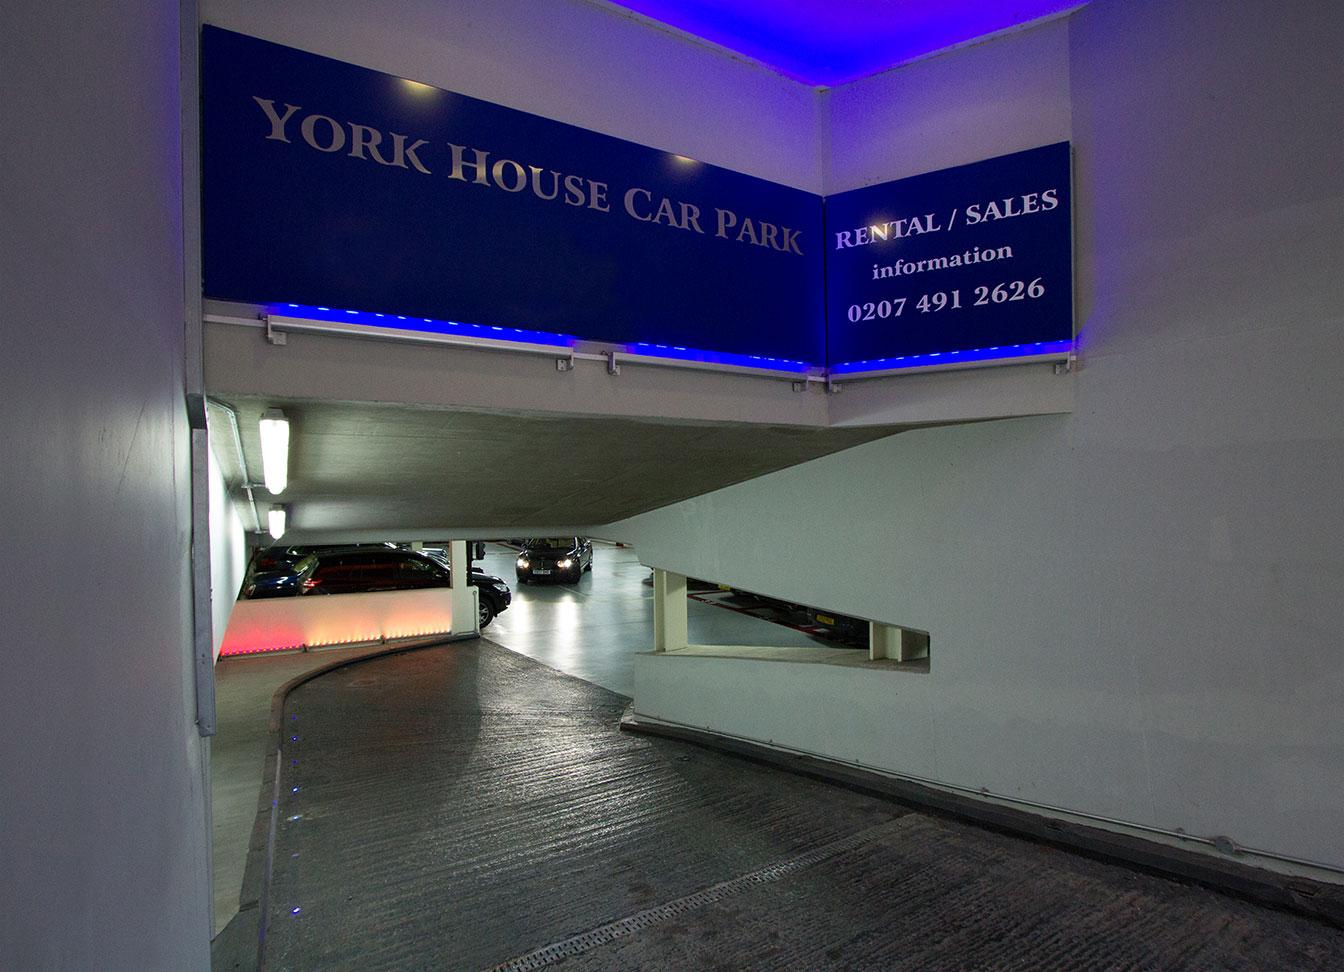 PML_Kensington-YorkHouse_03